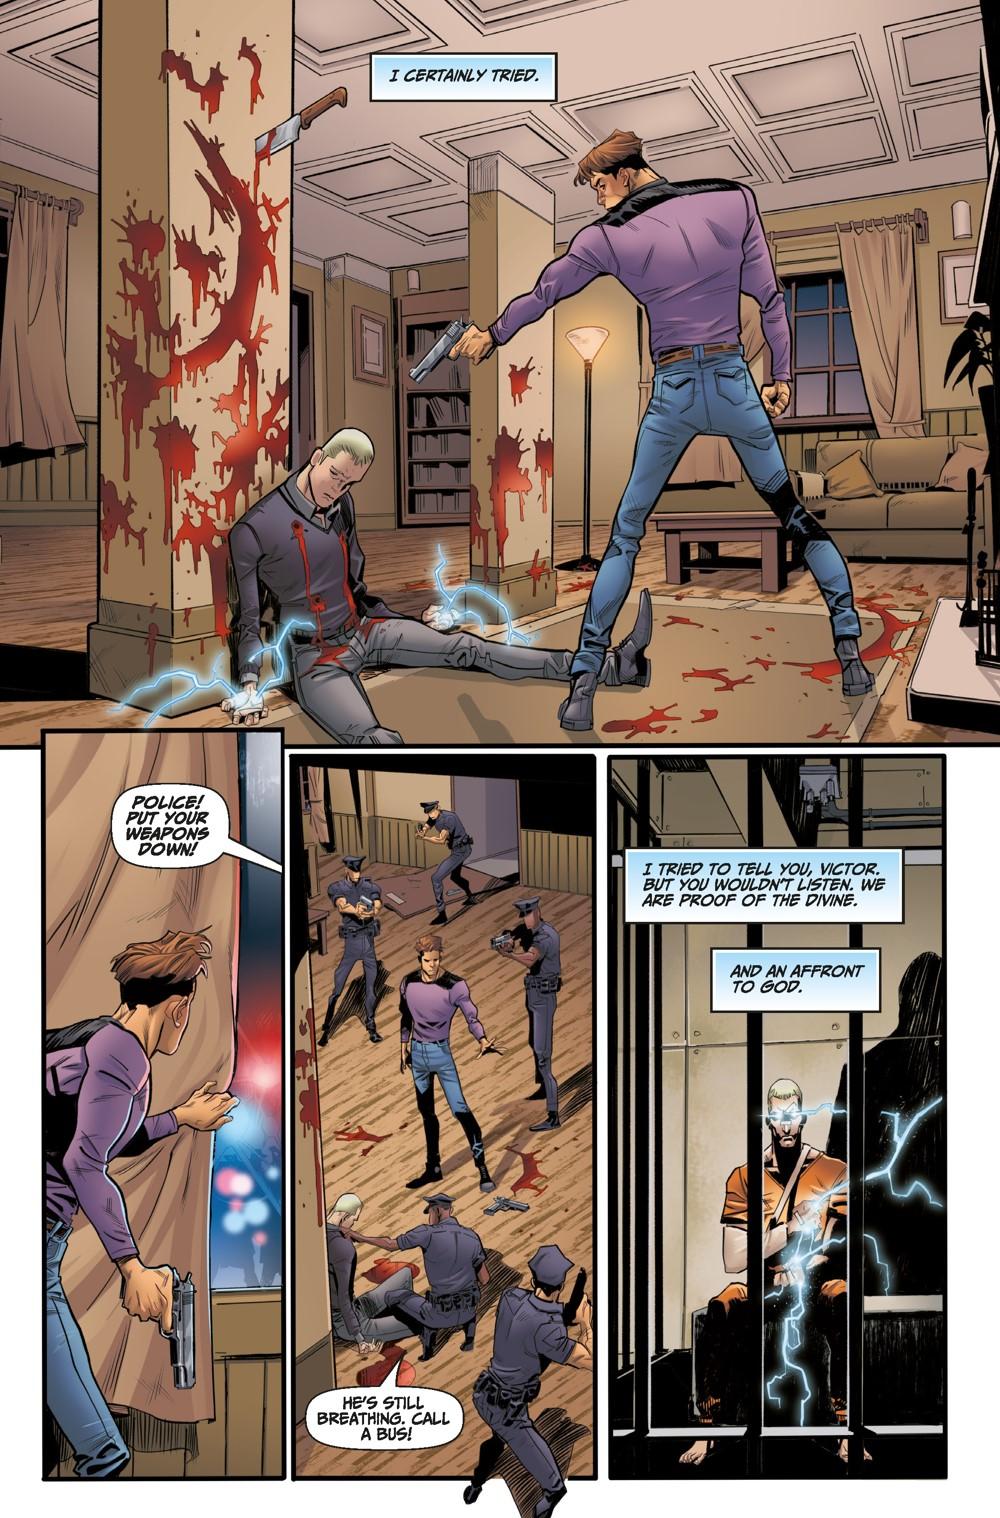 ExtraOrdinary1-_Page_4 ComicList Previews: EXTRAORDINARY #1